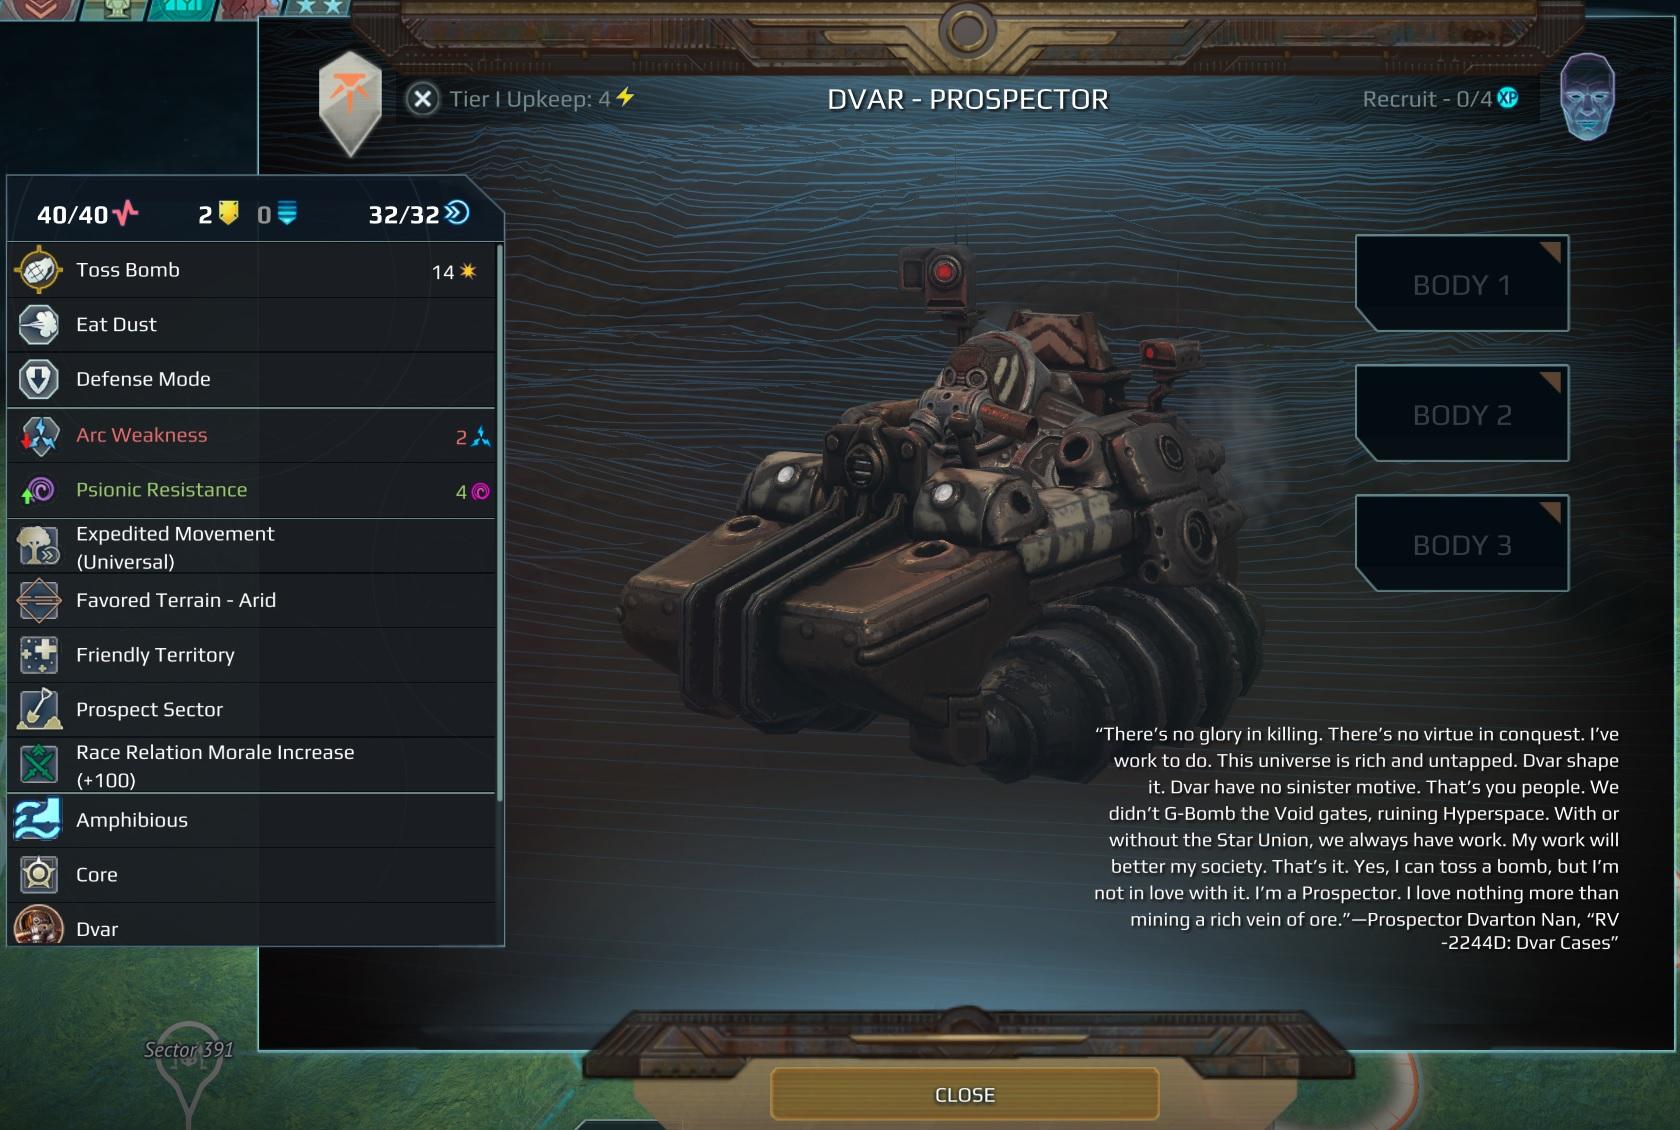 Age of Wonders: Planetfall – Dev Diary #21: The Dvar Faction